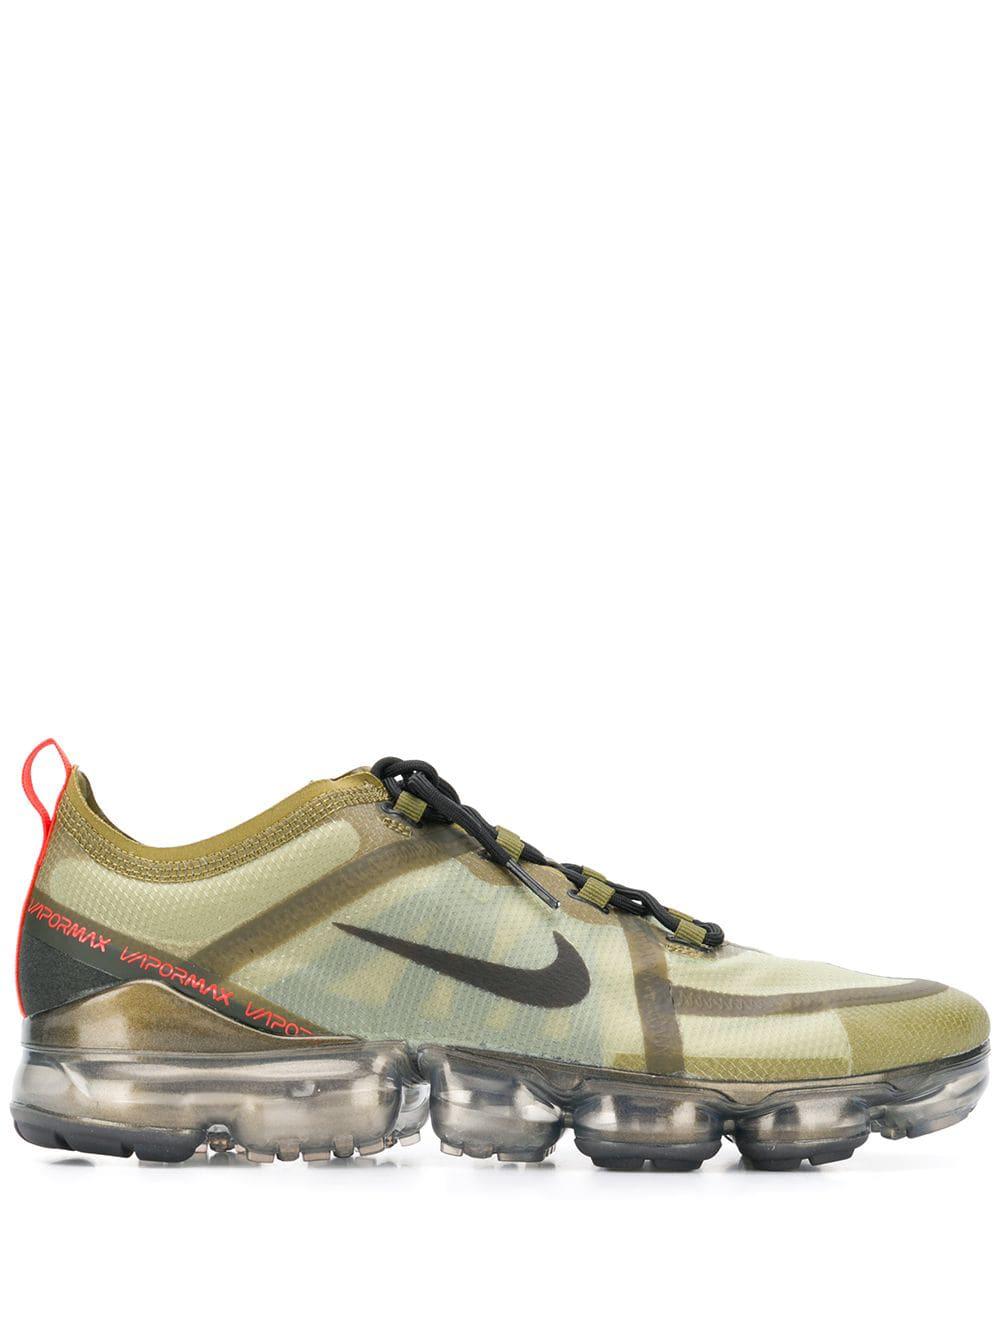 1fe15643195e3a Nike Vapormax 2019 Sneakers - Green